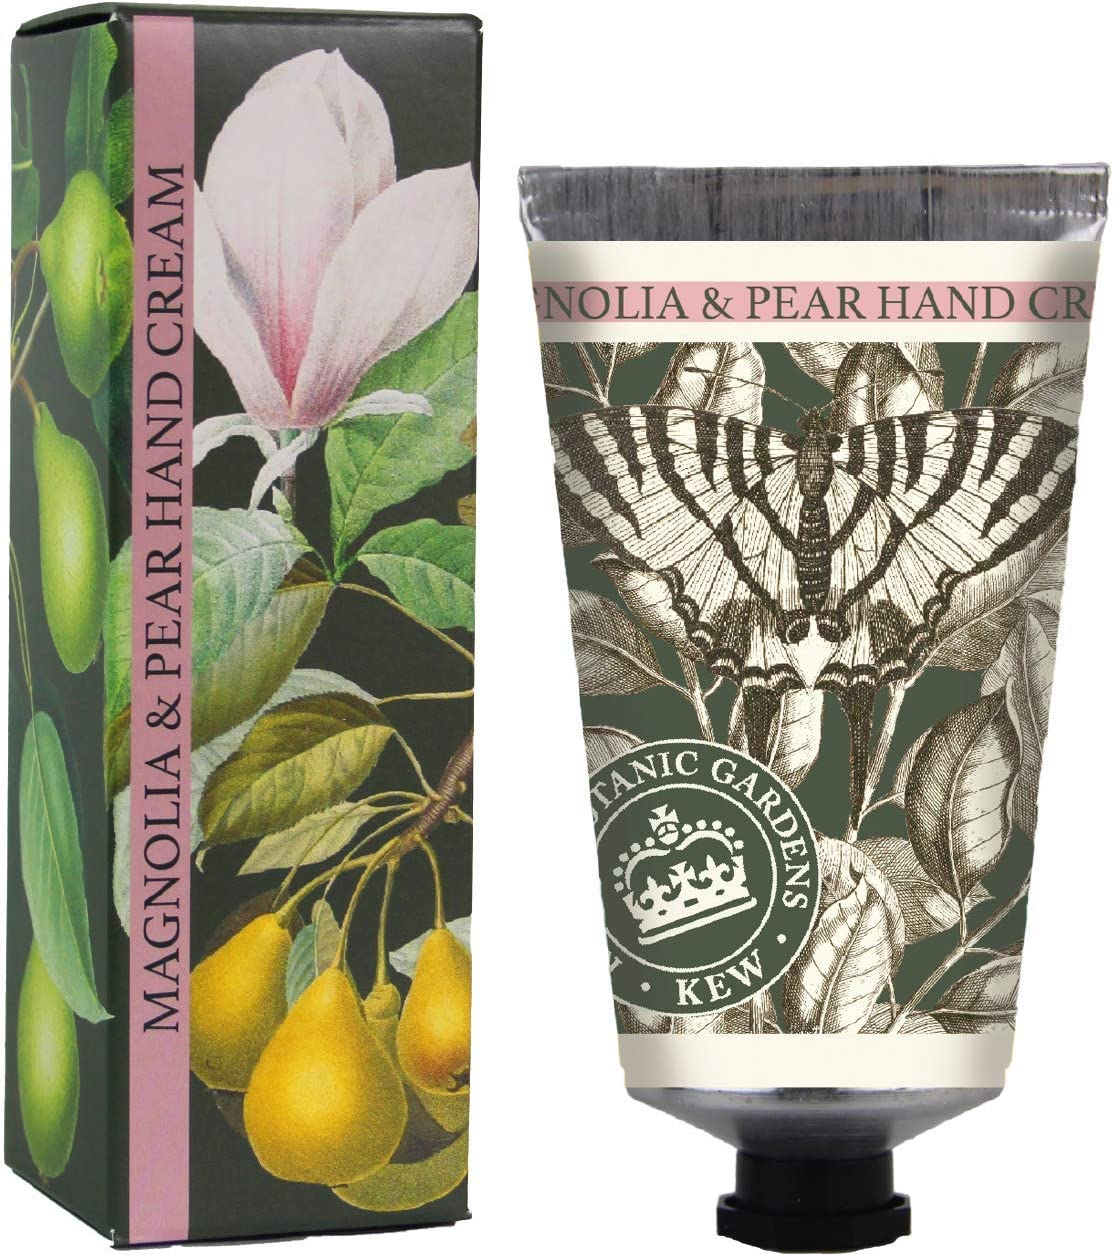 Royal Botanical Gardens, Kew Magnolia & Pear Hand Cream, 75mls